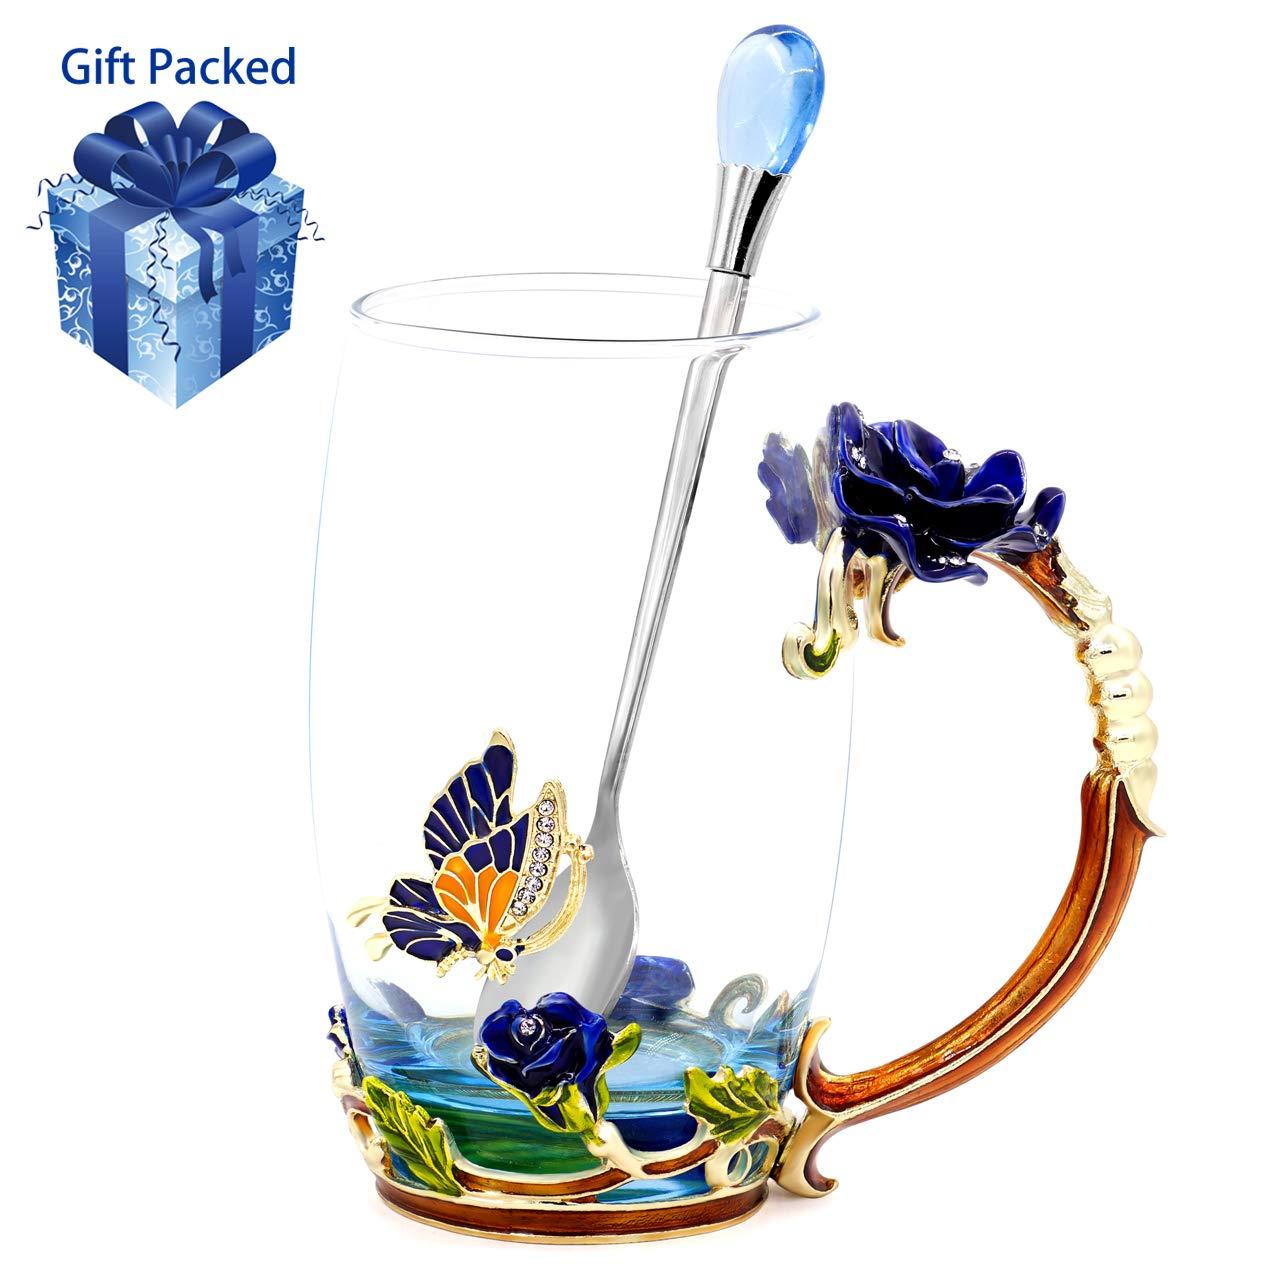 Daycindy Handmade Enamel Rose Teacup Black Tea Cup with Spoon Set (13oz, Rose Blue)